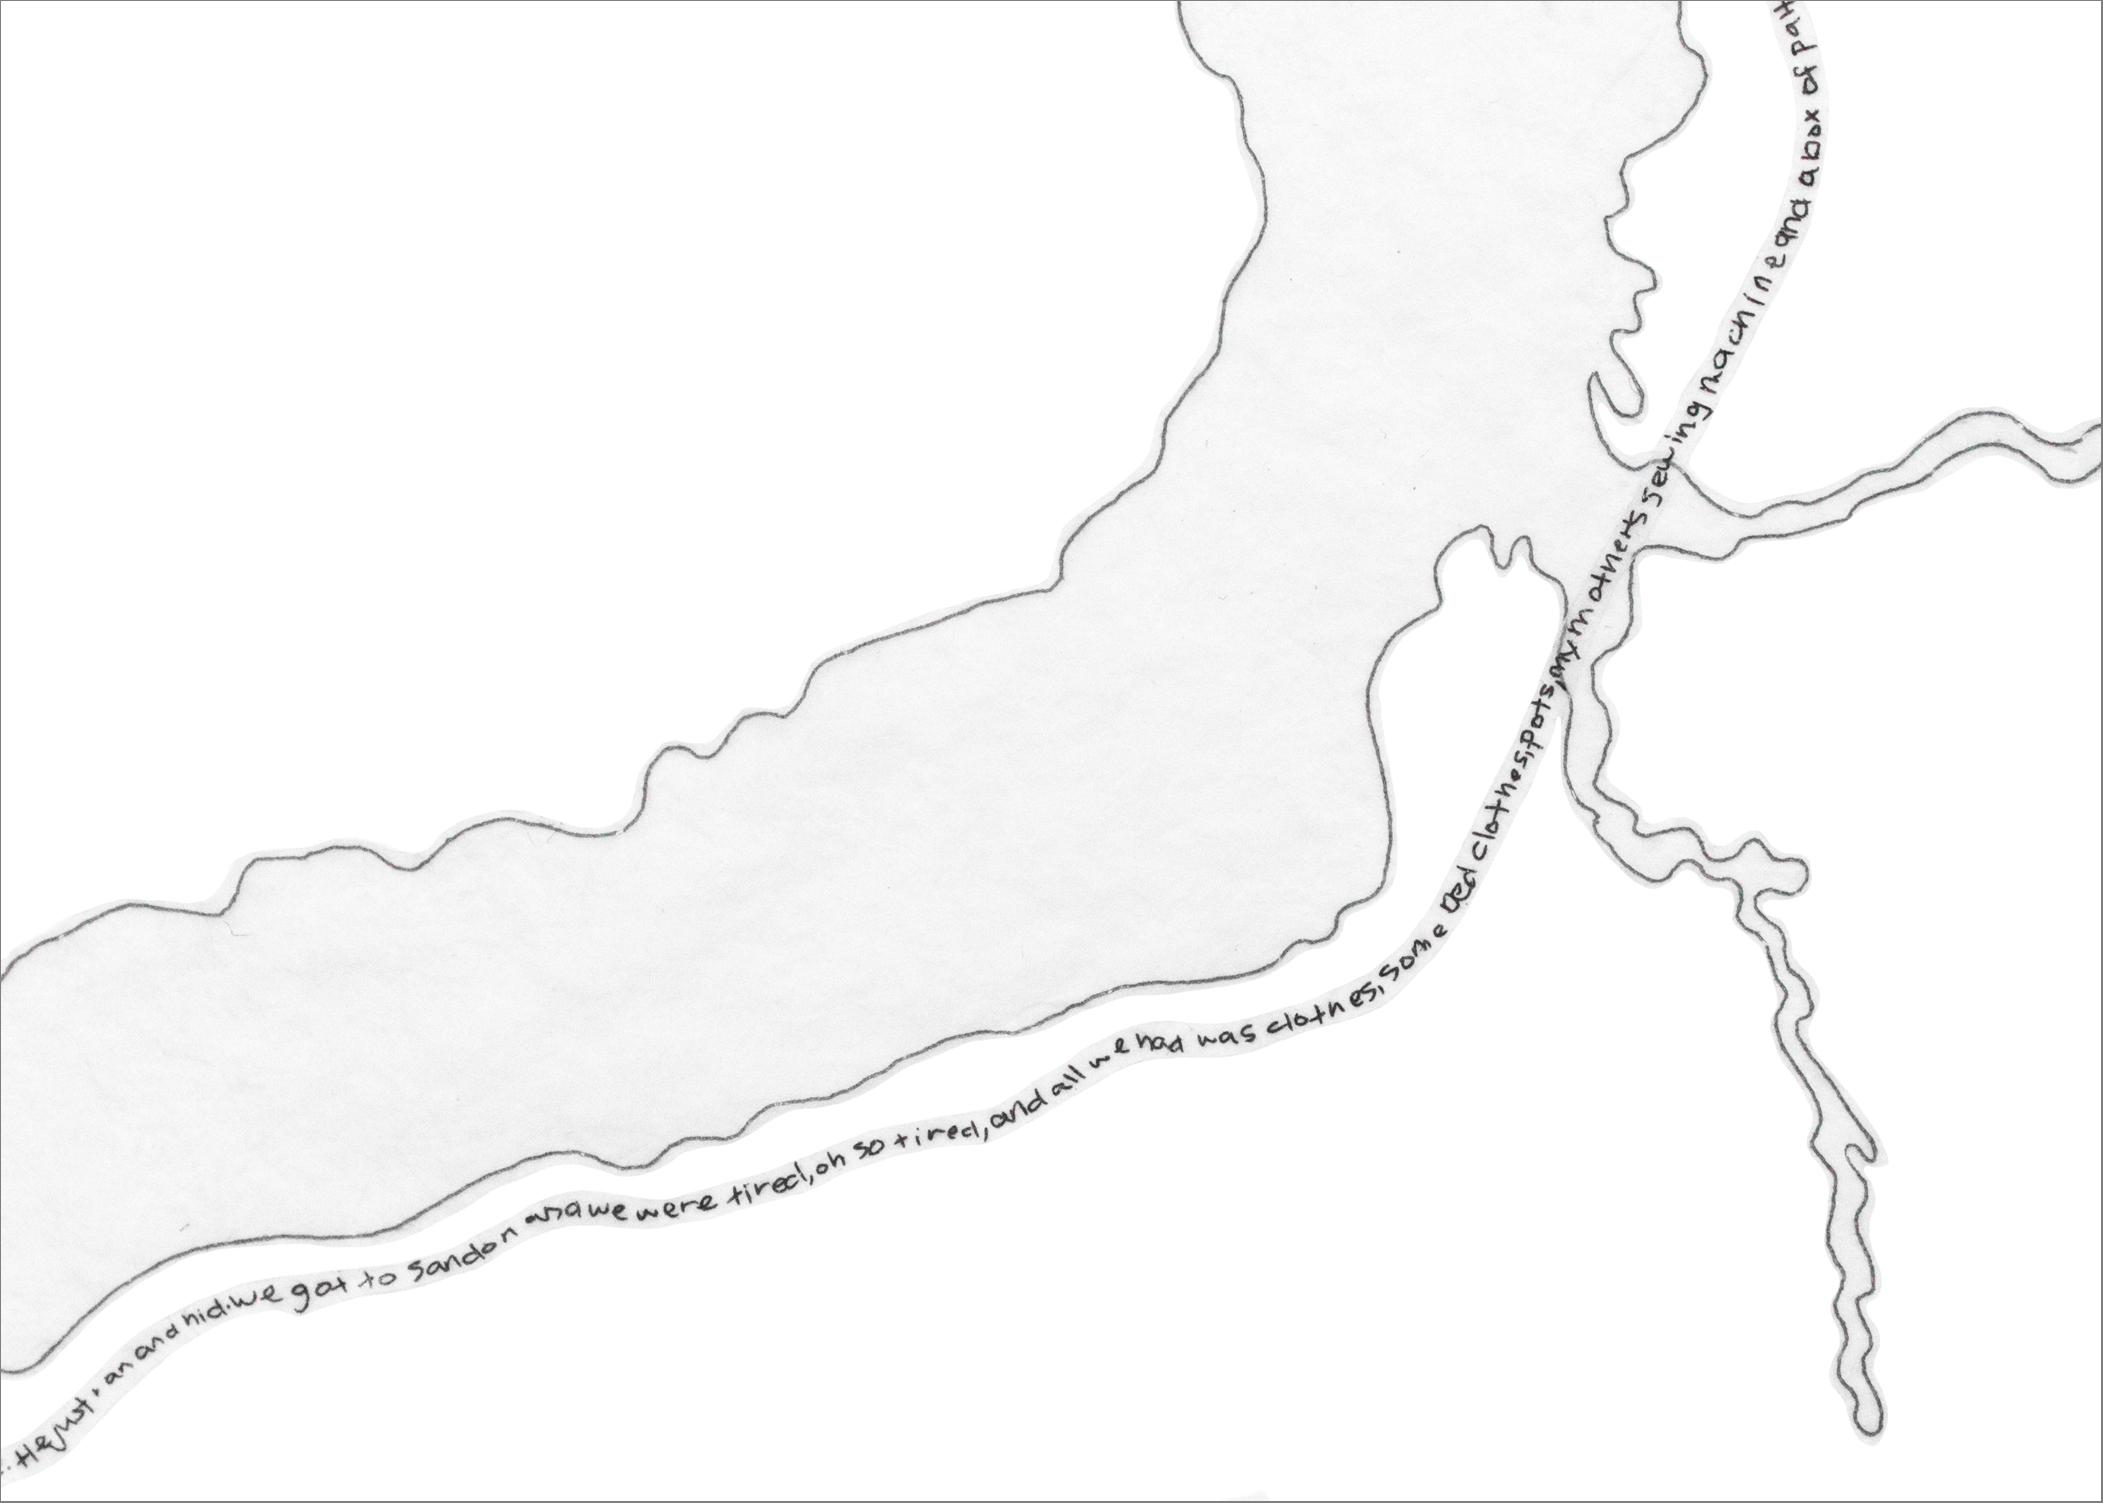 Lower Arrow Lake - Detail 2